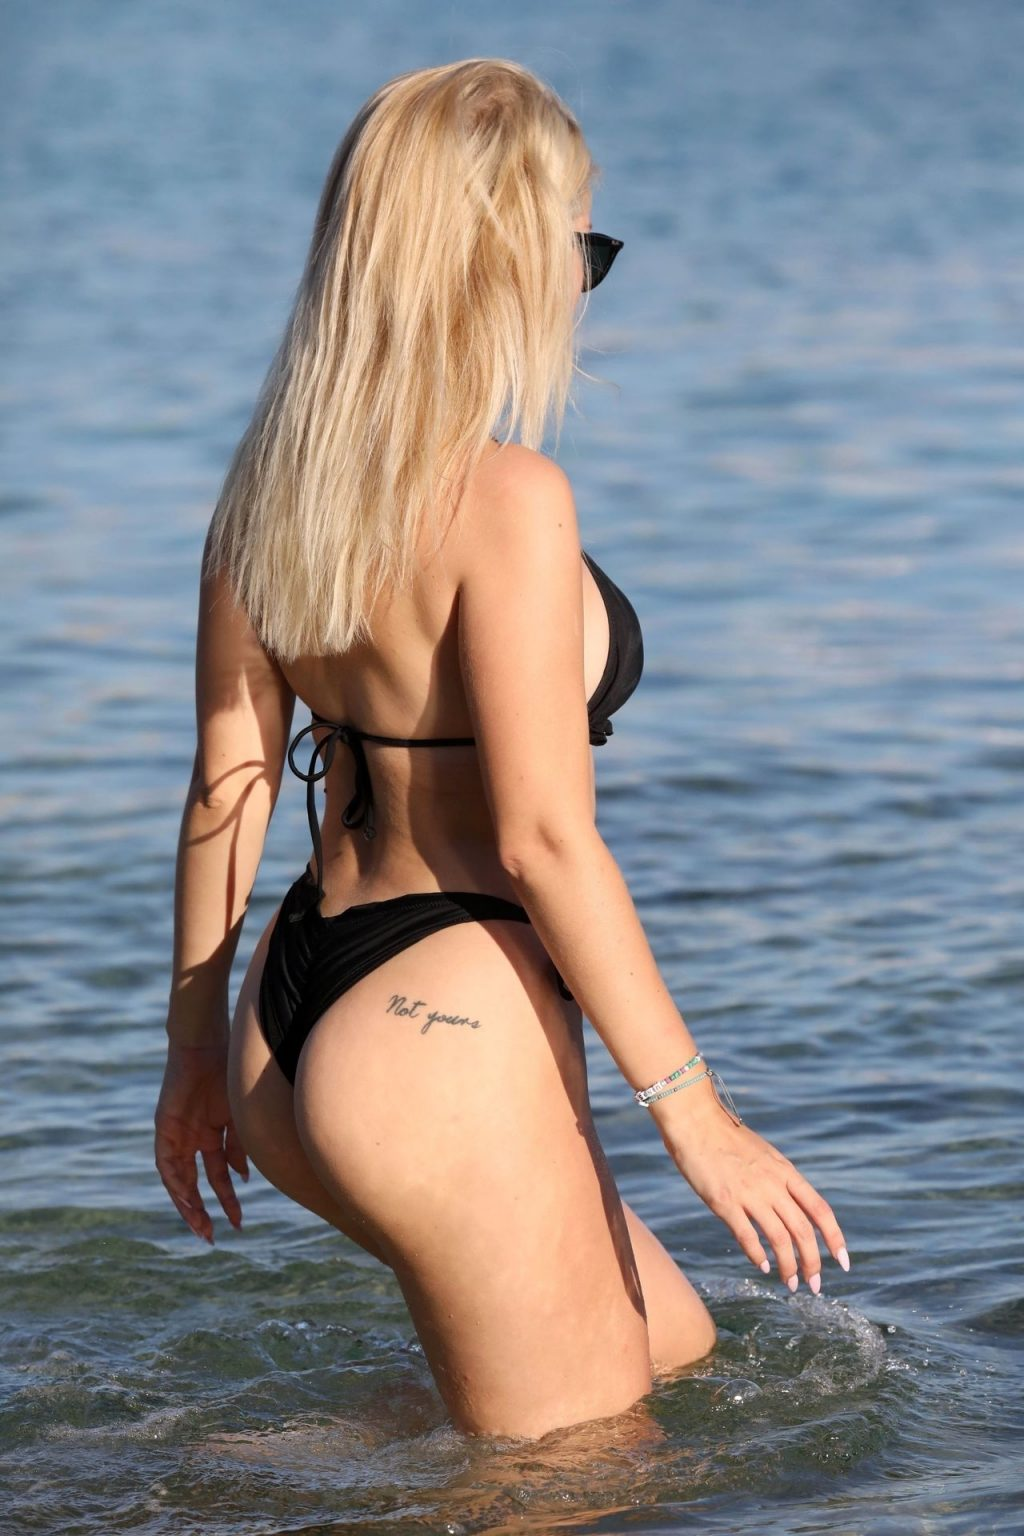 Lottie Moss Shows Off Her Sexy Bikini Body on the Beach in Mykonos (9 Photos)